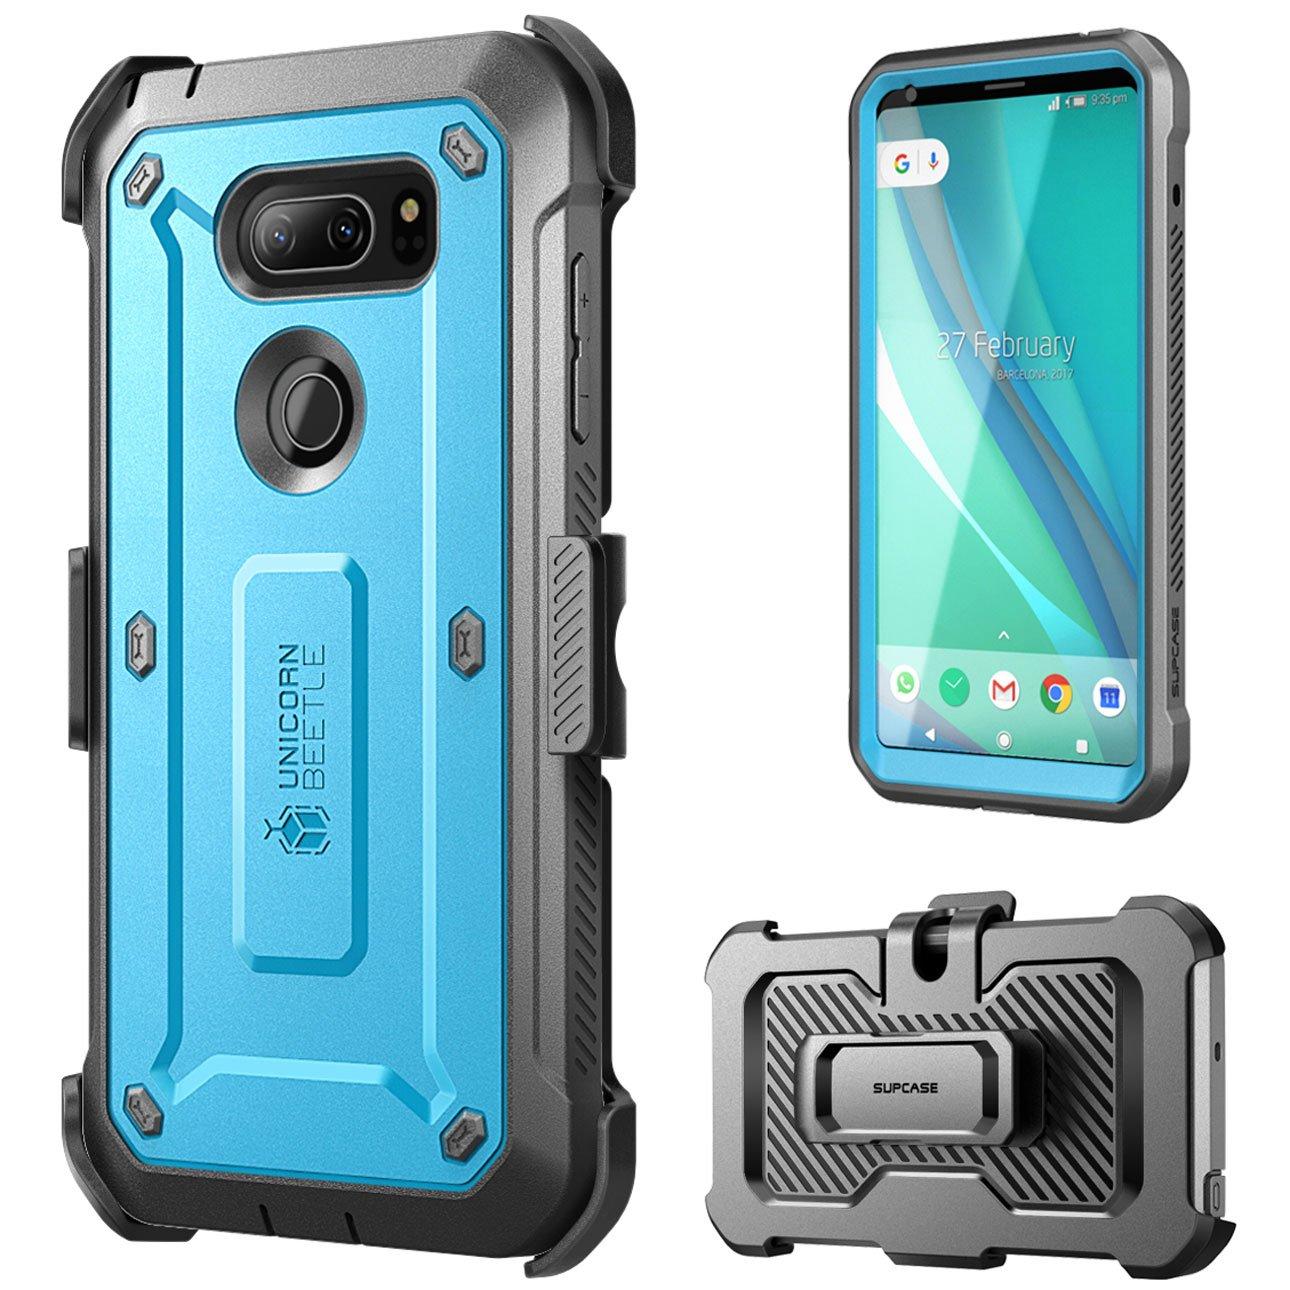 LG V30 Case, SUPCASE Full-body Rugged Holster Case with Built-in Screen Protector for LG V30, LG V30s,LG V35,LG V35 ThinQ,LG V30 Plus 2017 Release, Unicorn Beetle PRO Series(Blue/Gray) by SUPCASE (Image #2)